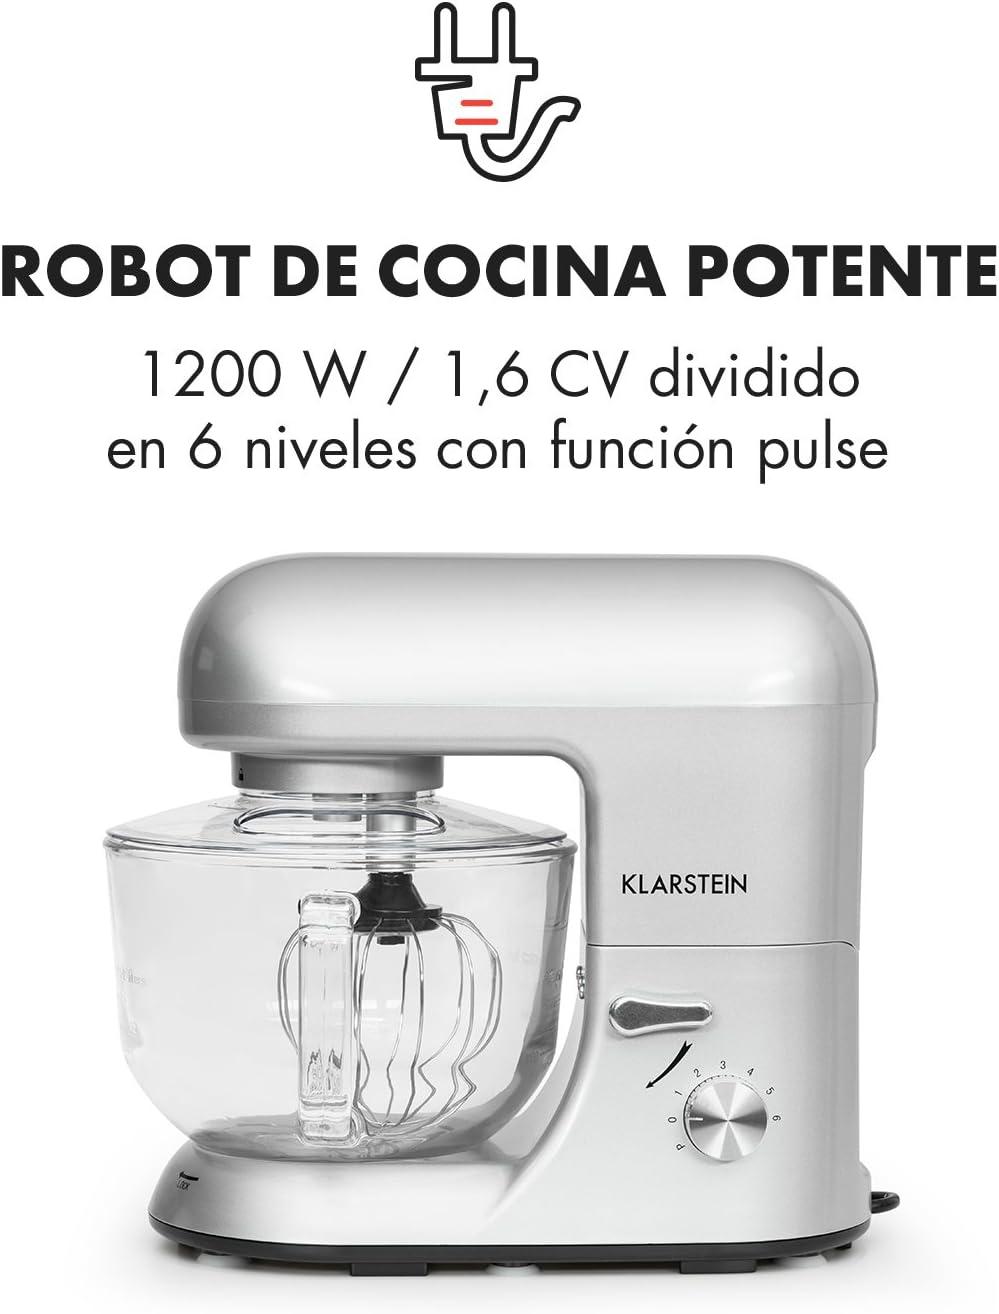 Klarstein - Bella Argentea 2G, Robot de Cocina, Mezcla, Amasadora ...